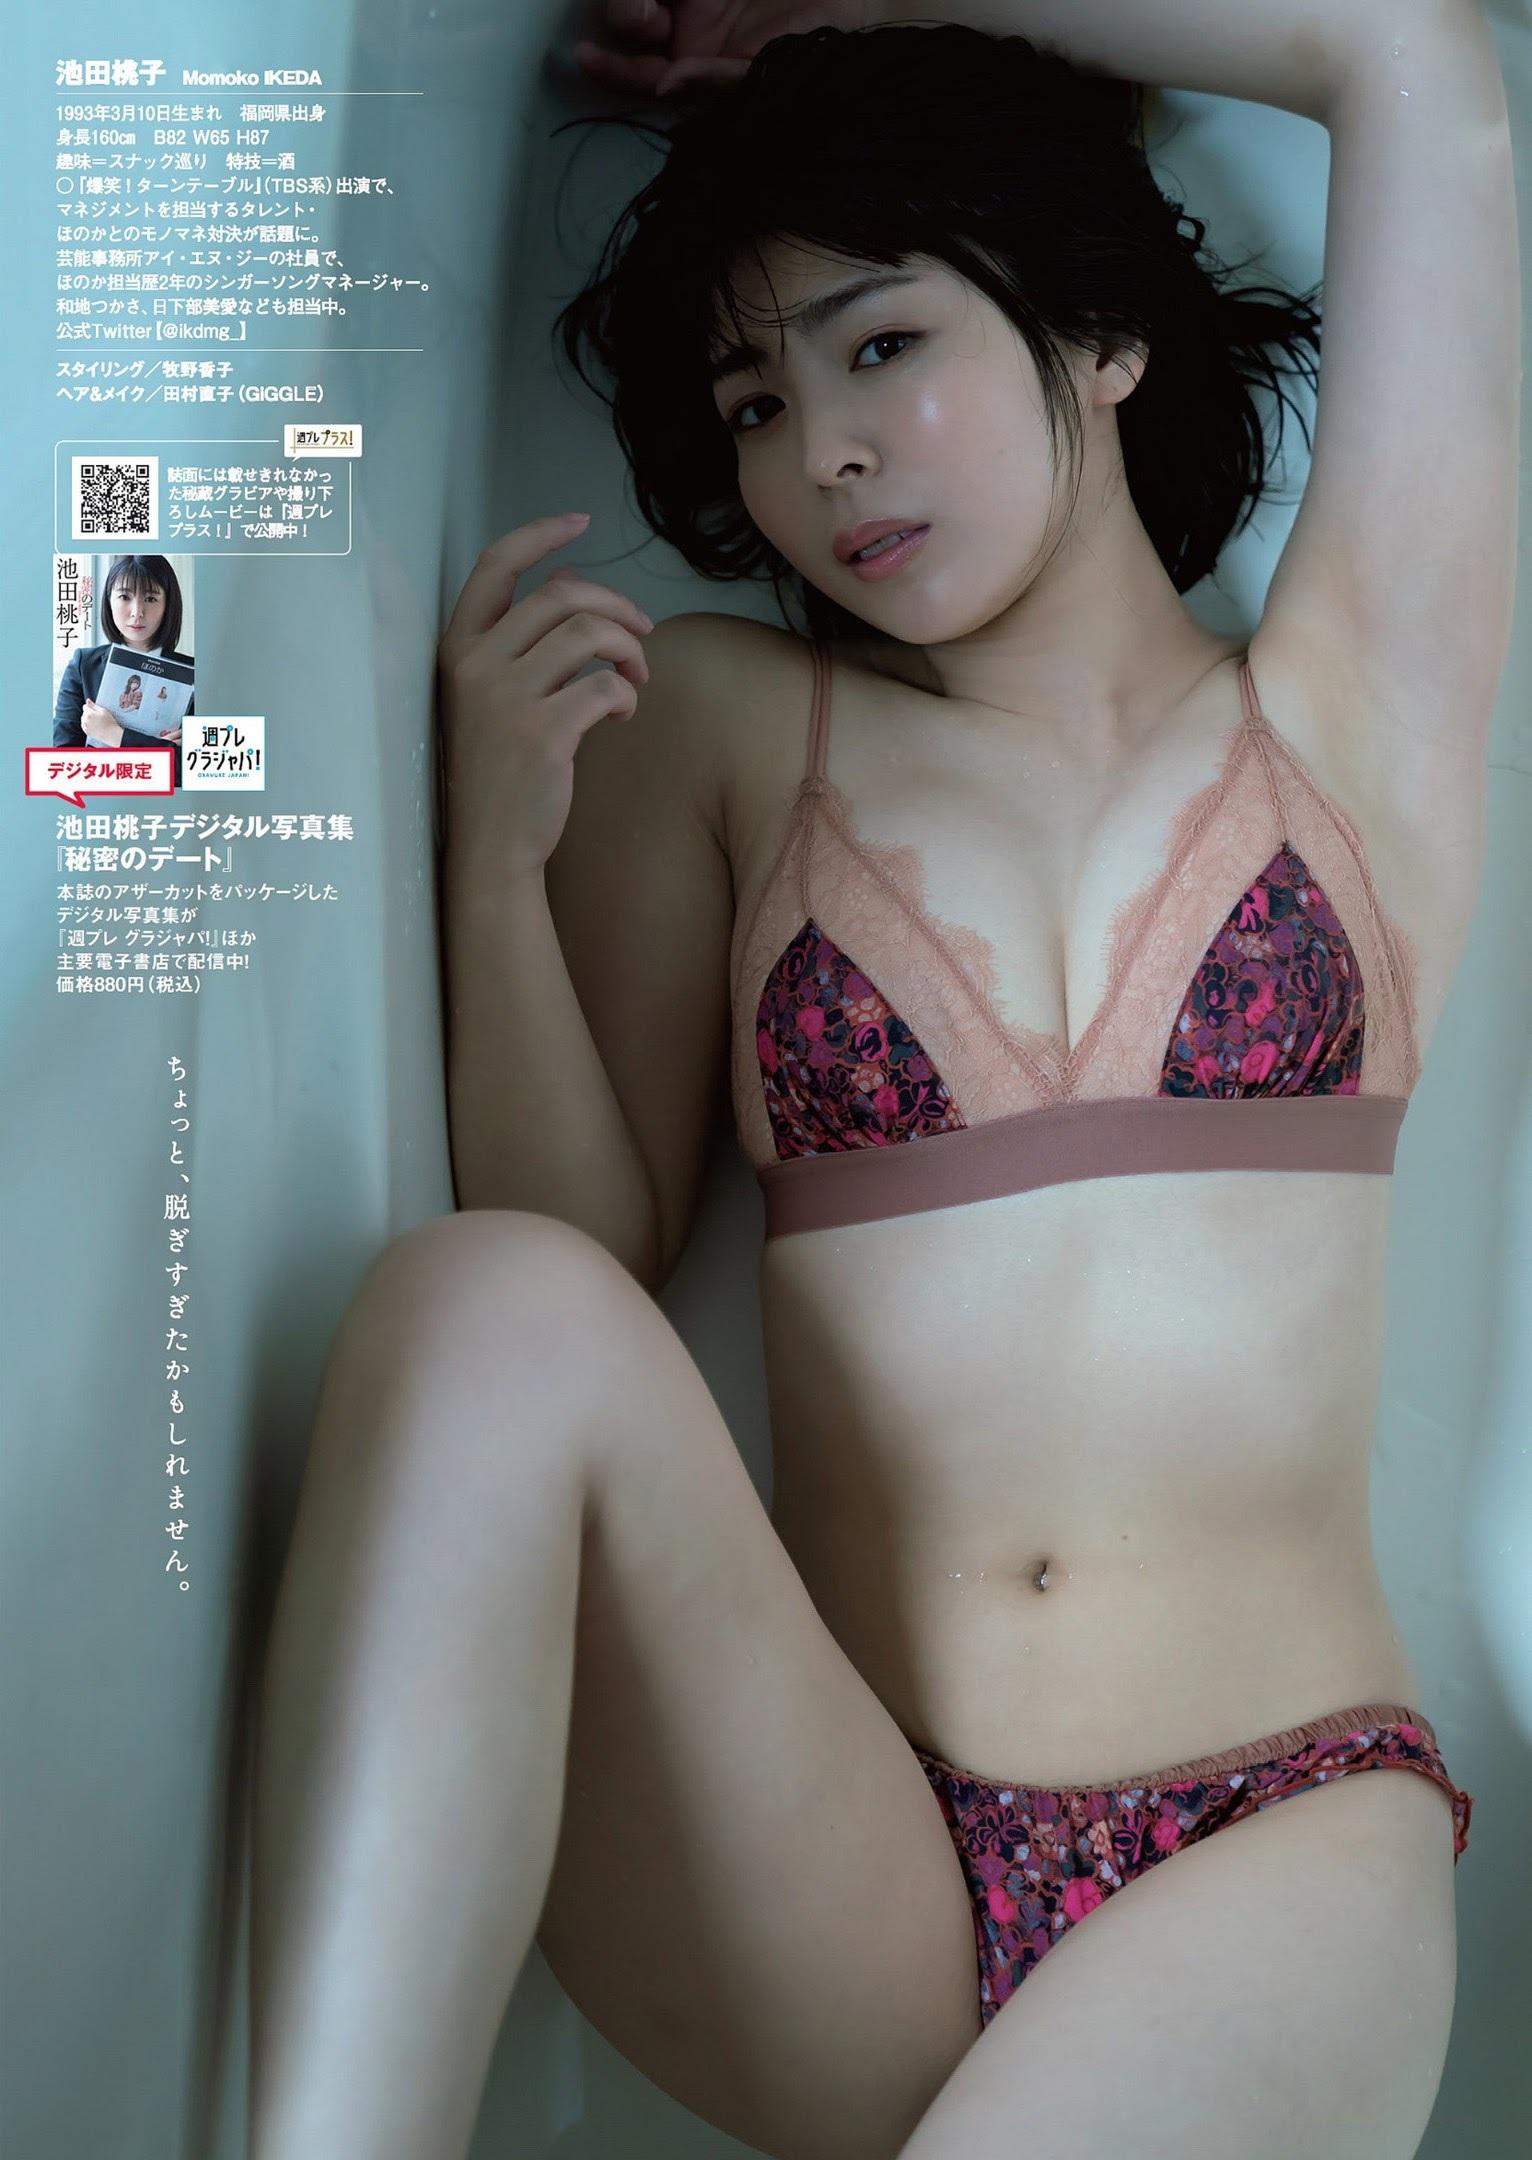 小山璃奈 頓知気さきな 伊藤美来-Weekly Playboy 2021年第十八期 高清套图 第71张